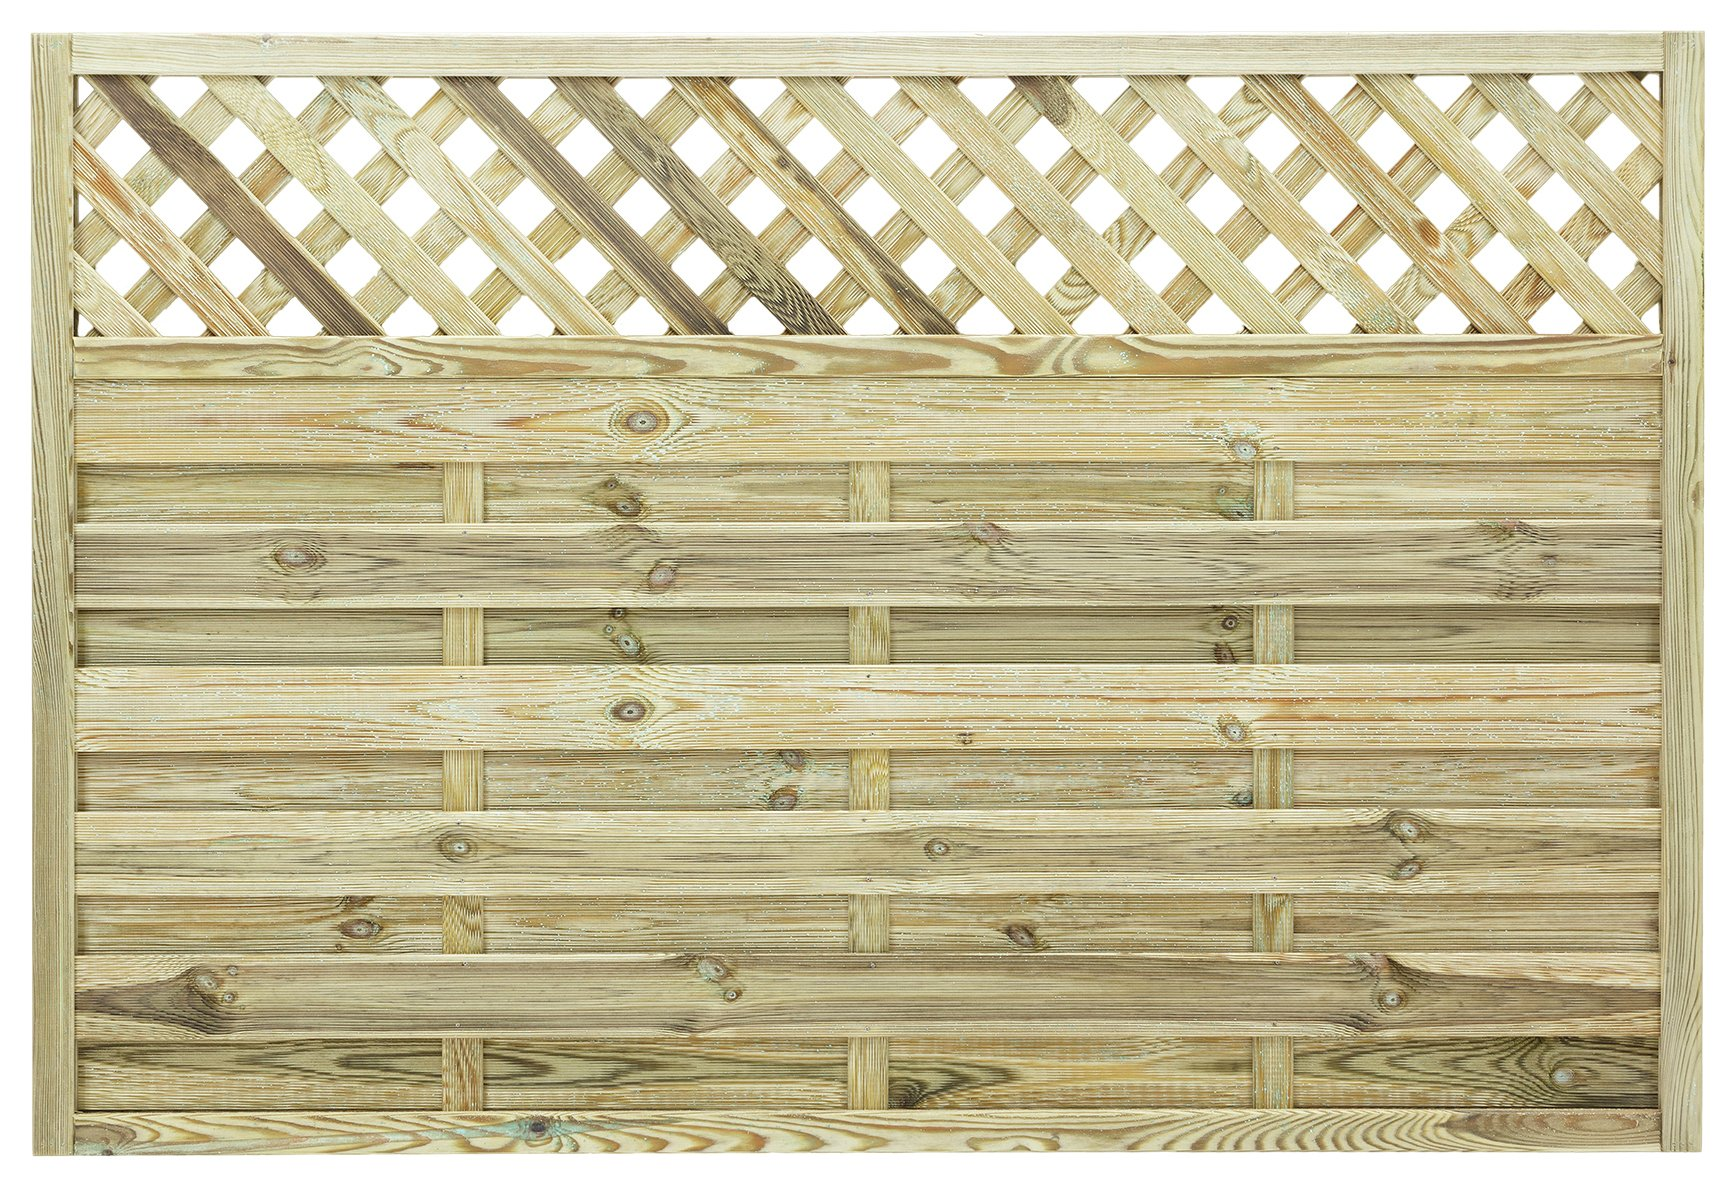 Grange - Elite St Malo 12m Fence Panel - Pack of 5 lowest price